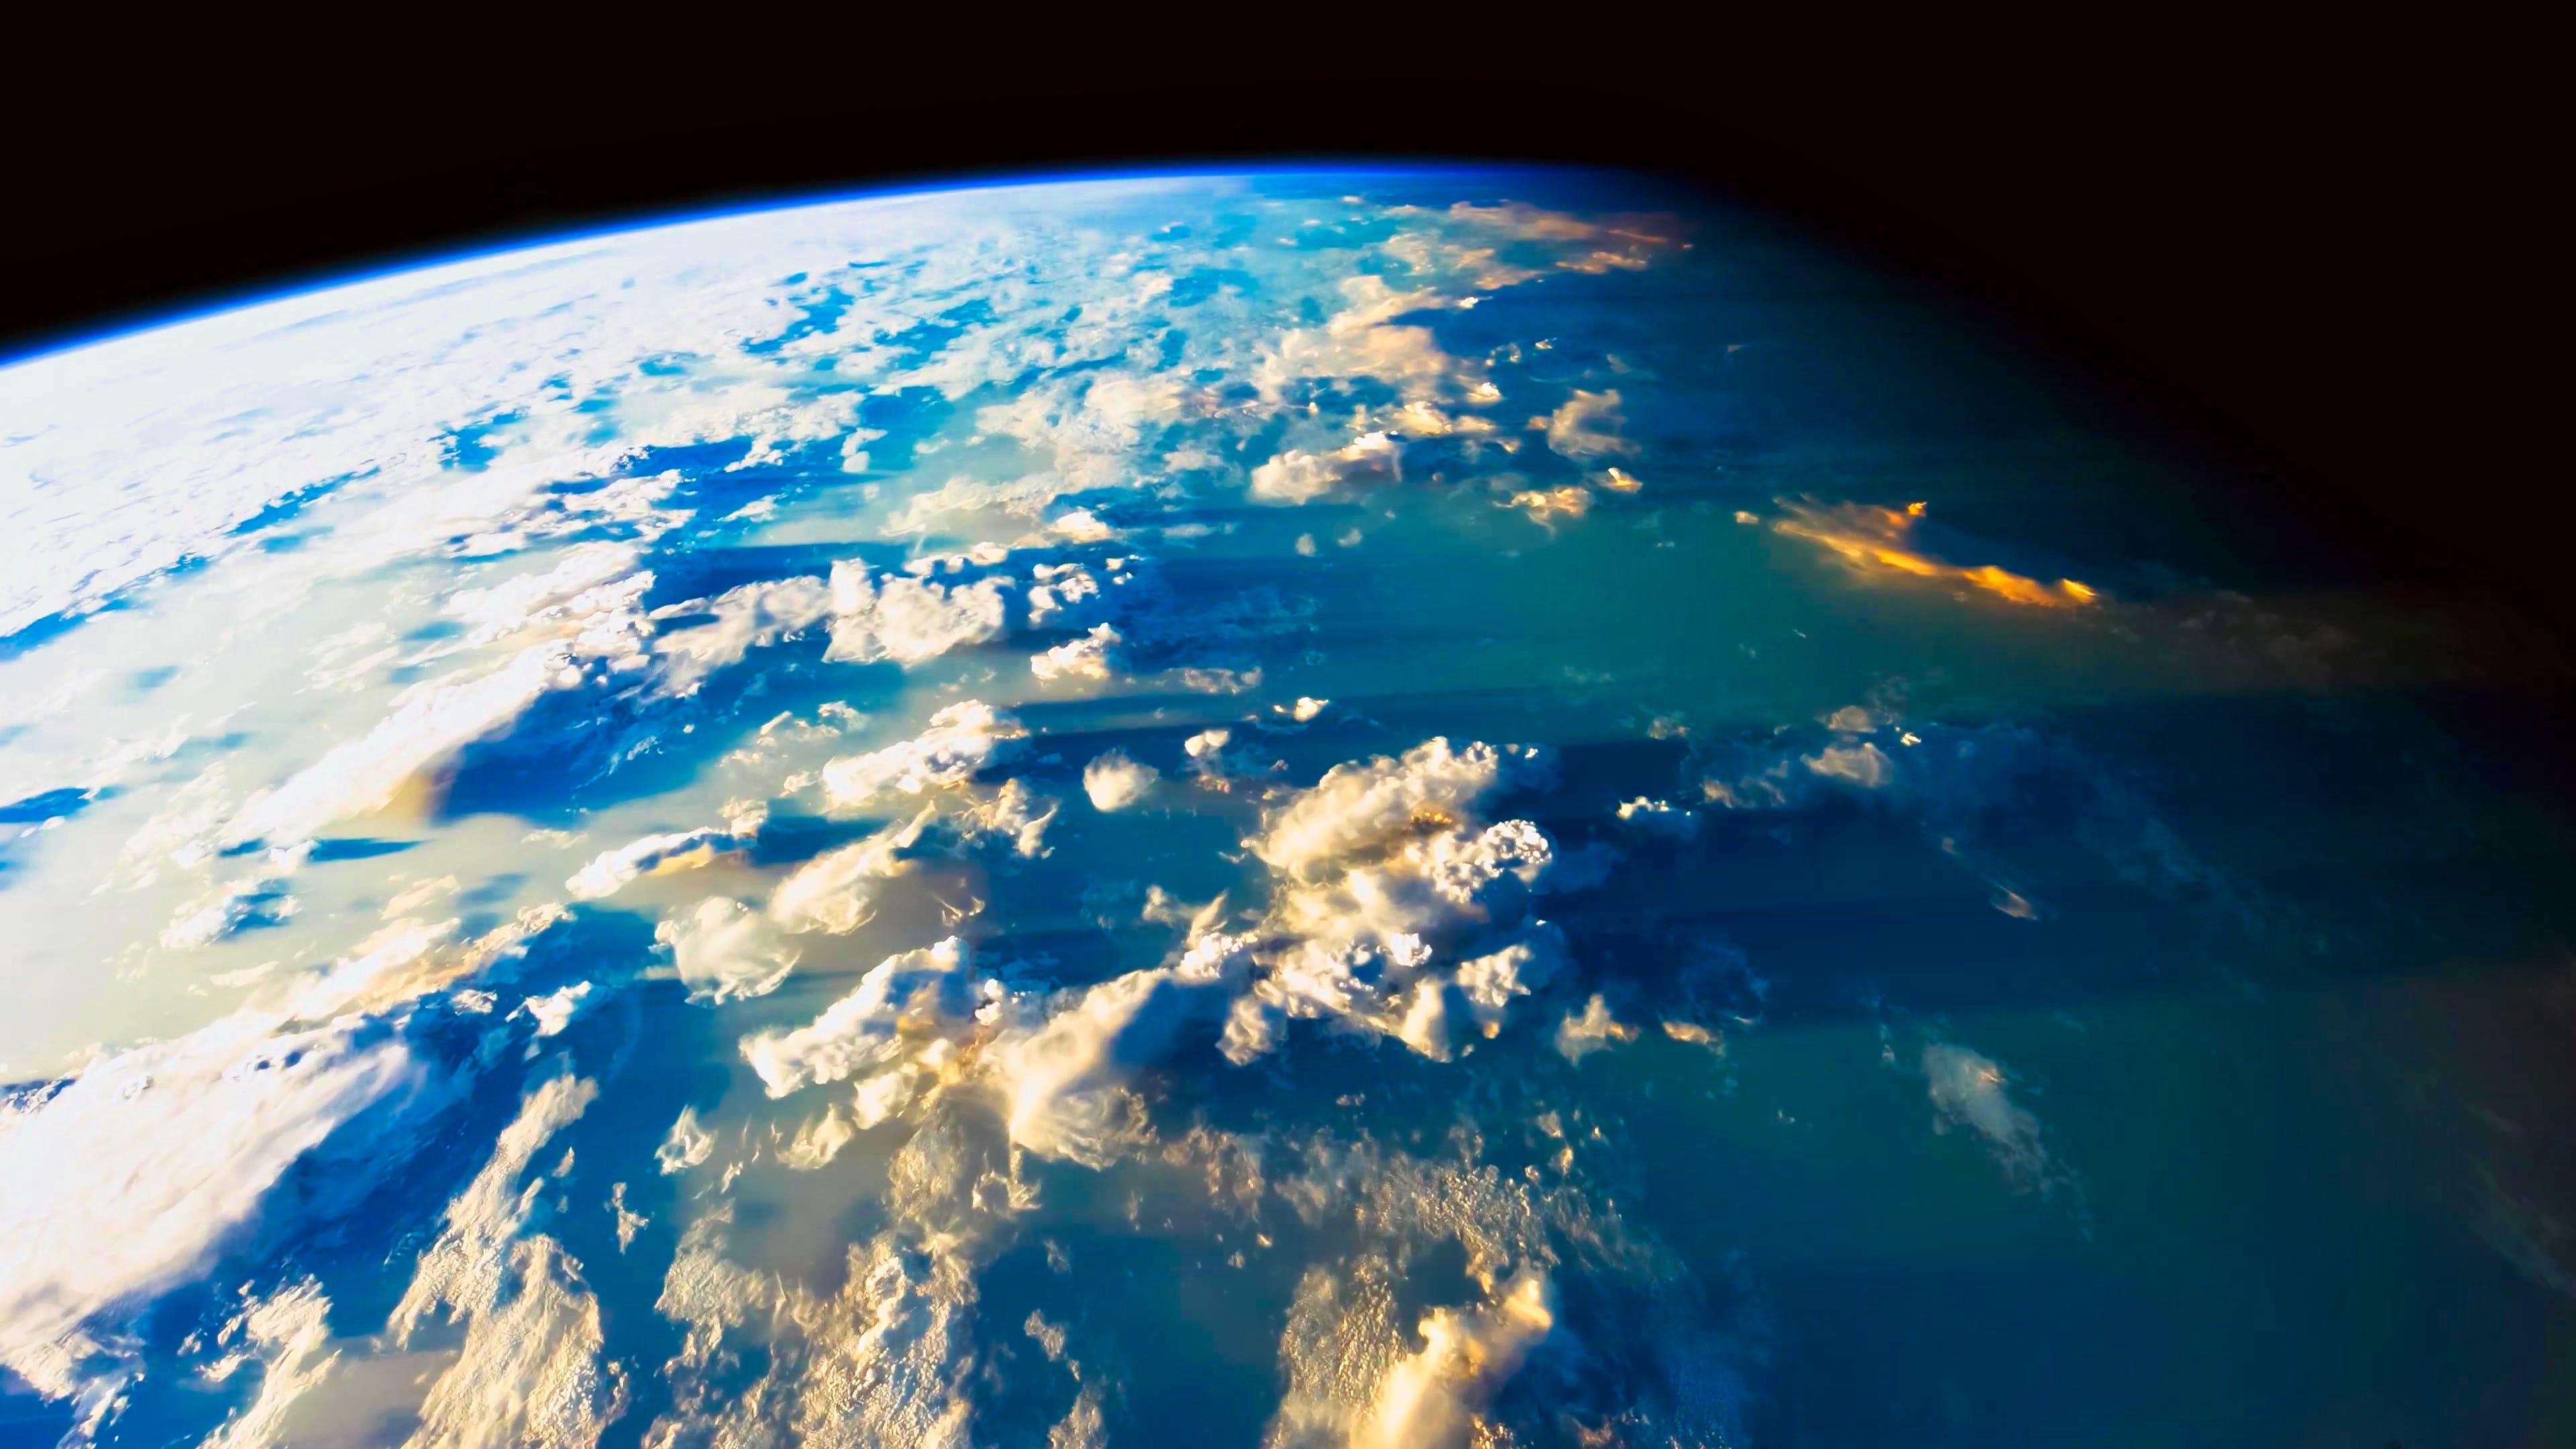 Kostenloses Stock Foto zu satellit, sonnenaufgang, sonnenuntergang, tiefer ozean